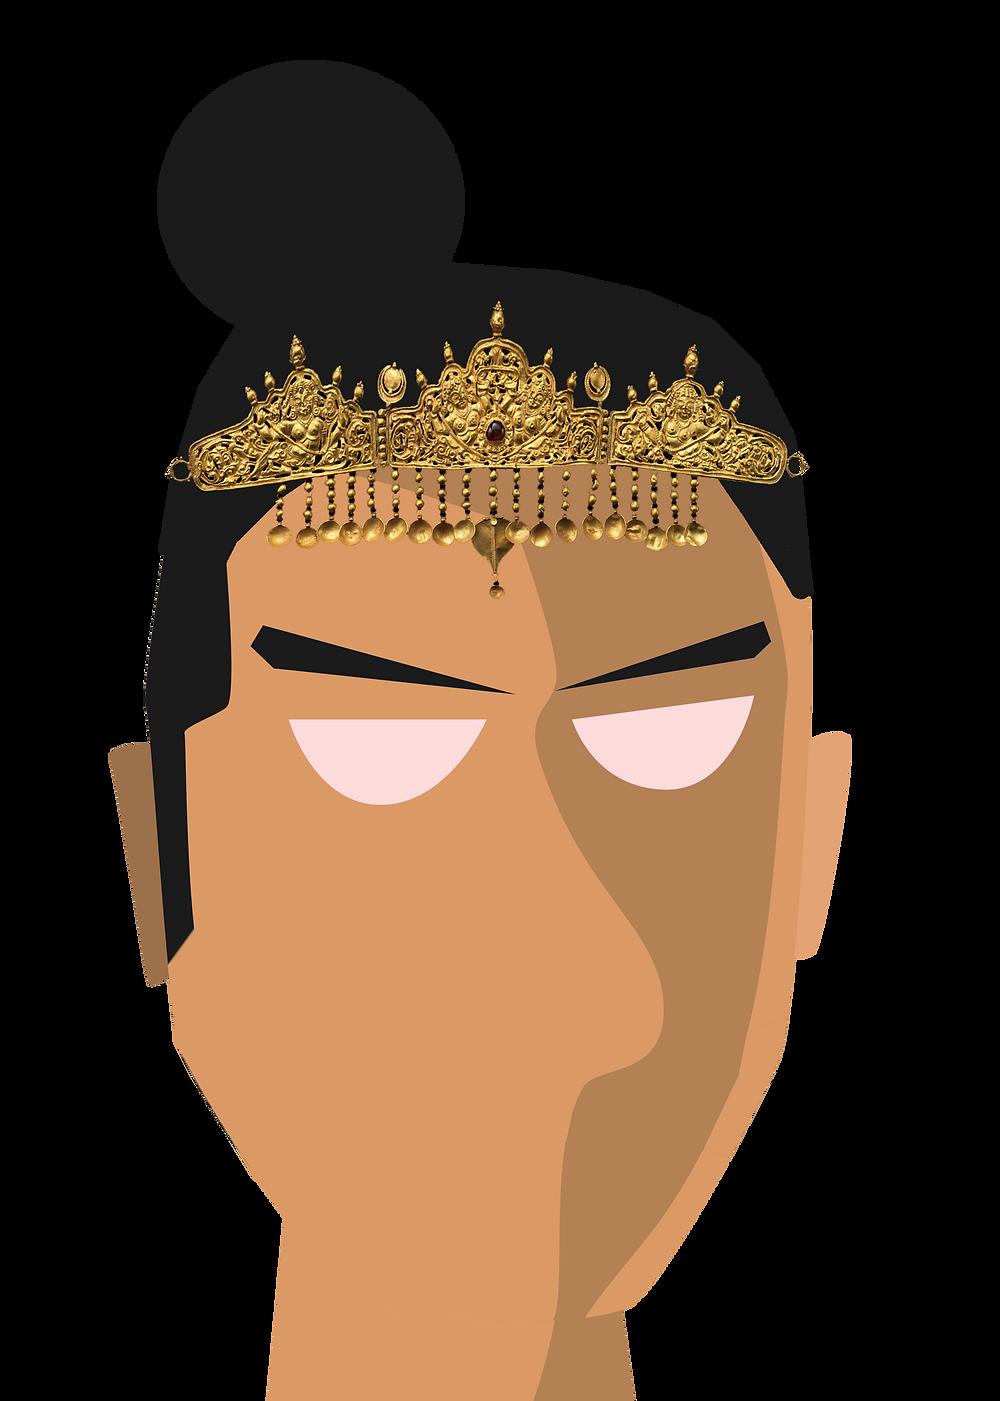 Vector portrait of the Ganga king Butuga II, by Arjunan Ullas based on art by Keshav Rajendran